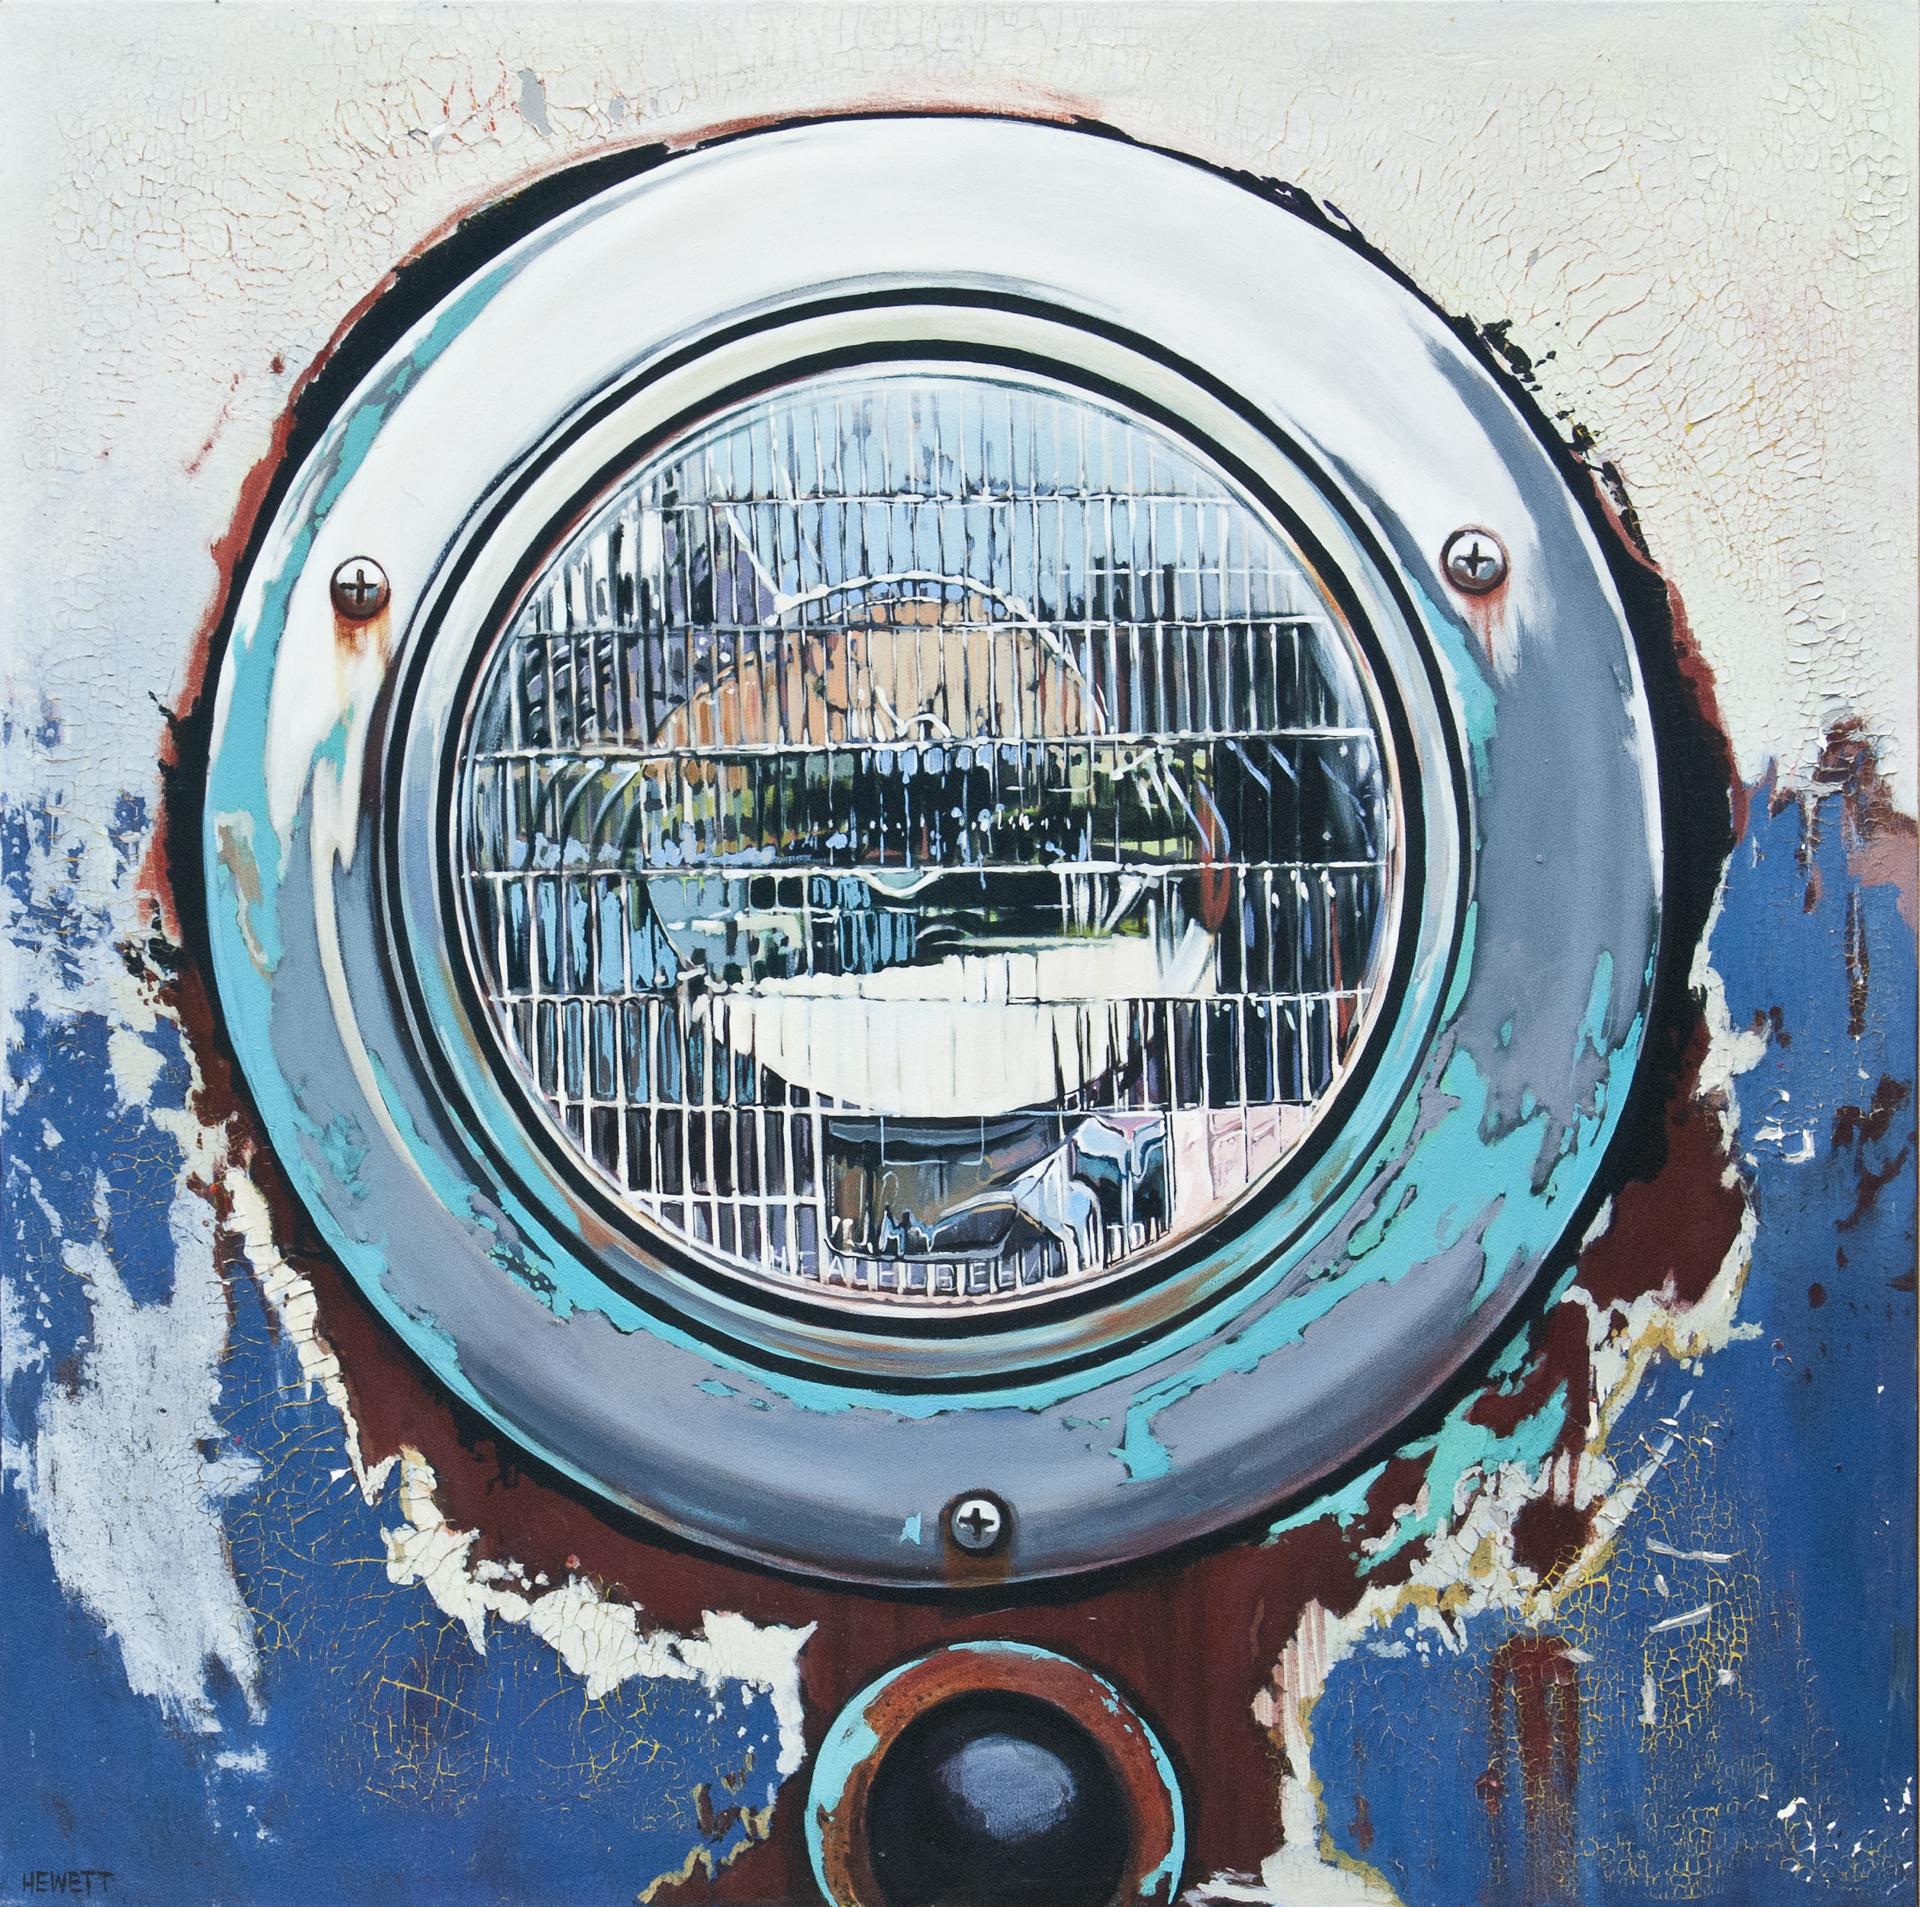 Headlight Blue by Scott Hewett